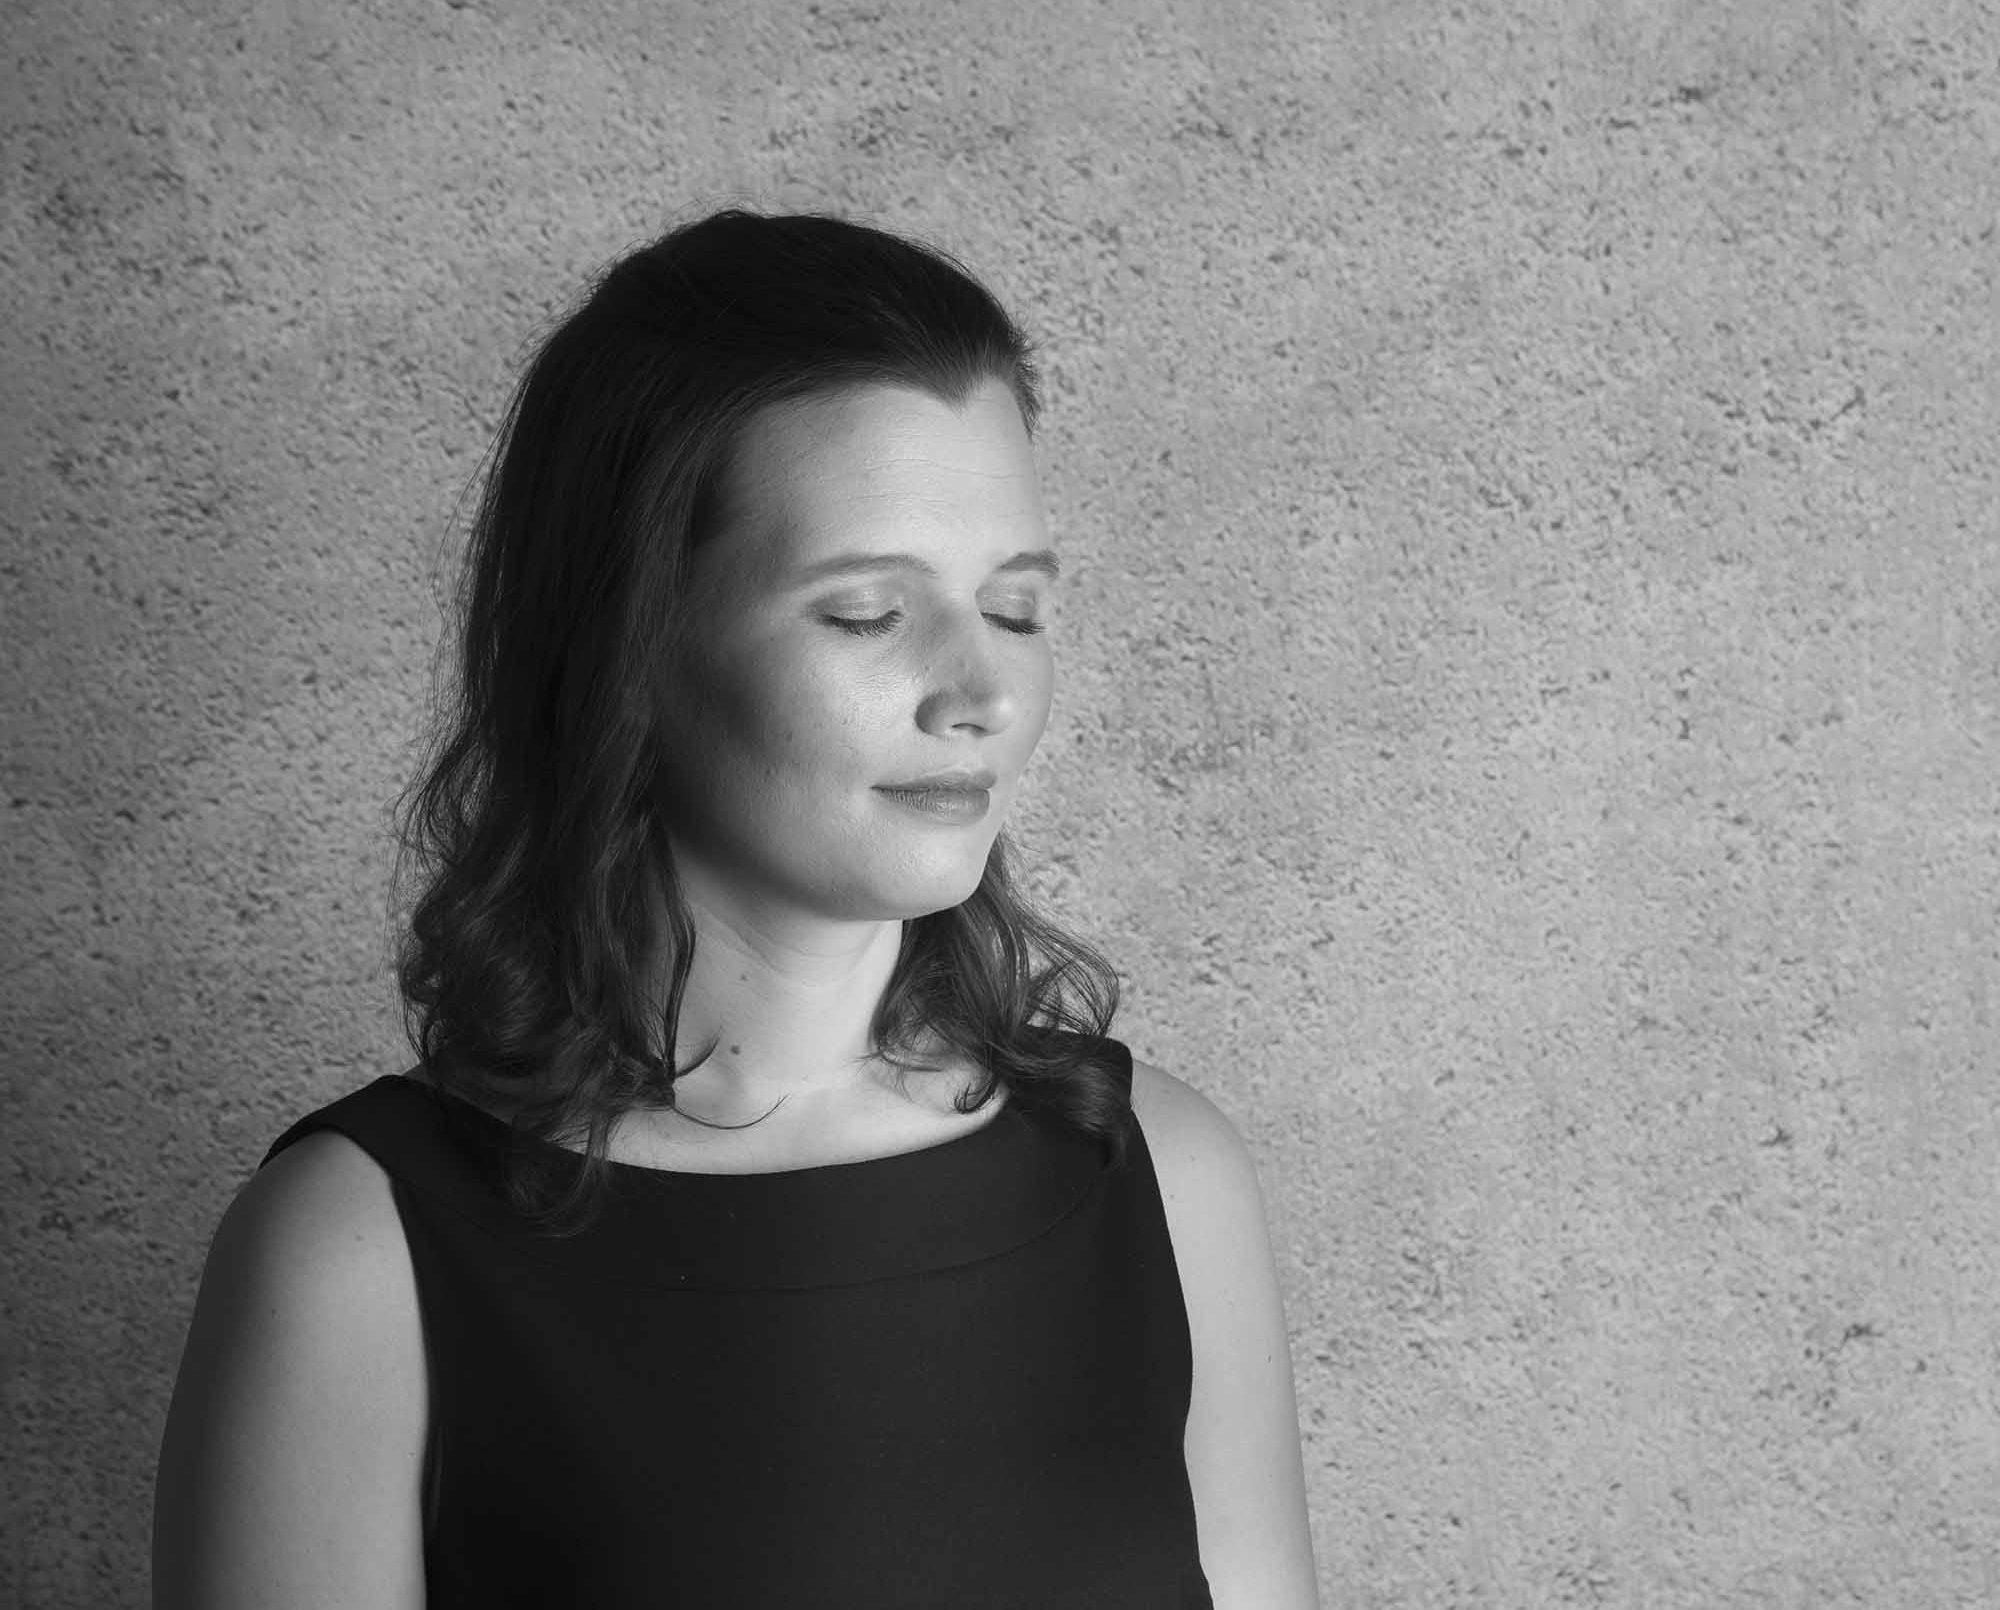 Eva-Marie Ferraro geb. Pausch schwarz-weiß Augen geschlossen